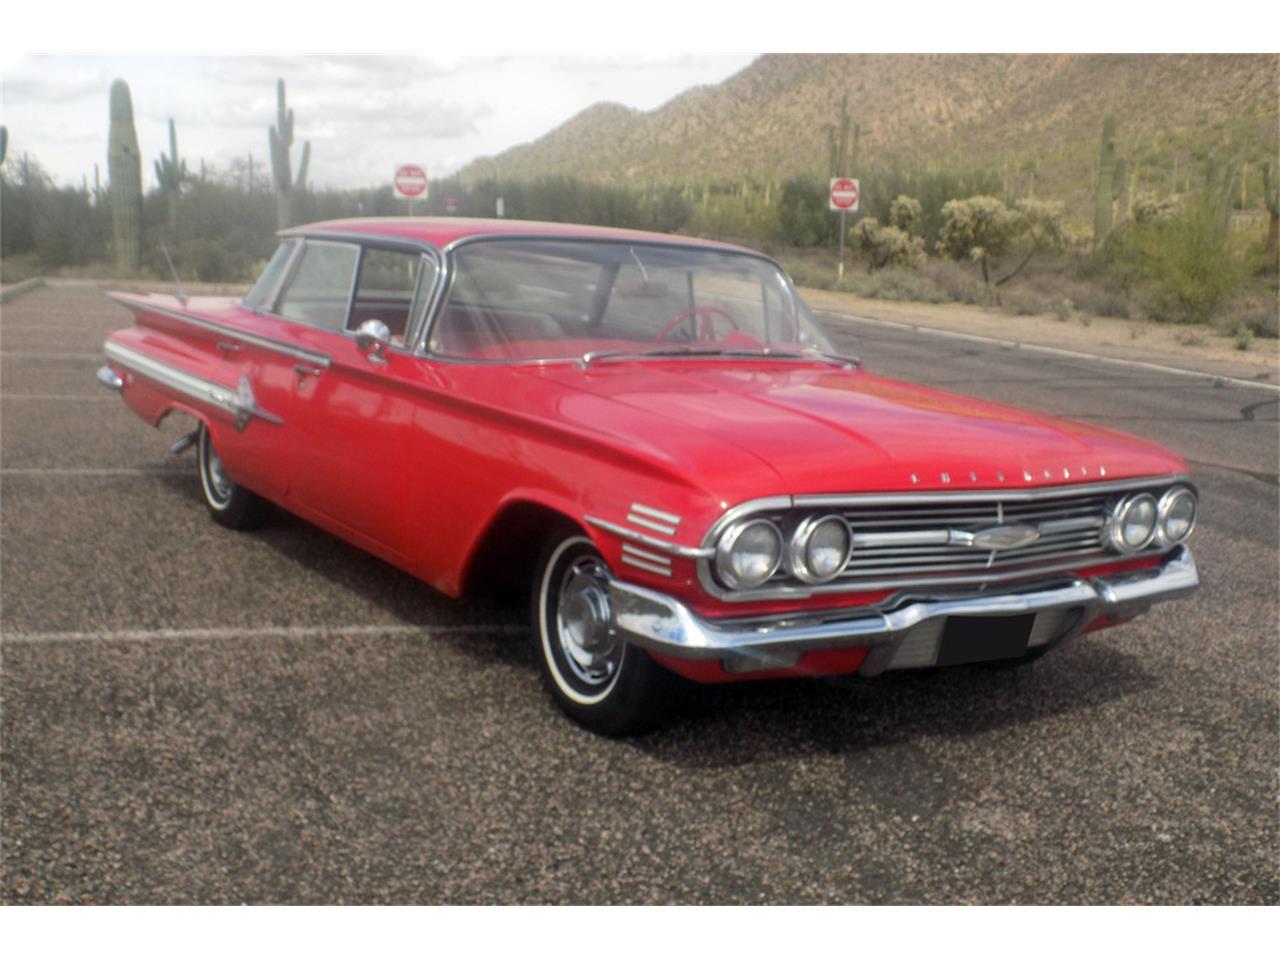 1960 Chevrolet Impala (CC-1304799) for sale in Scottsdale, Arizona